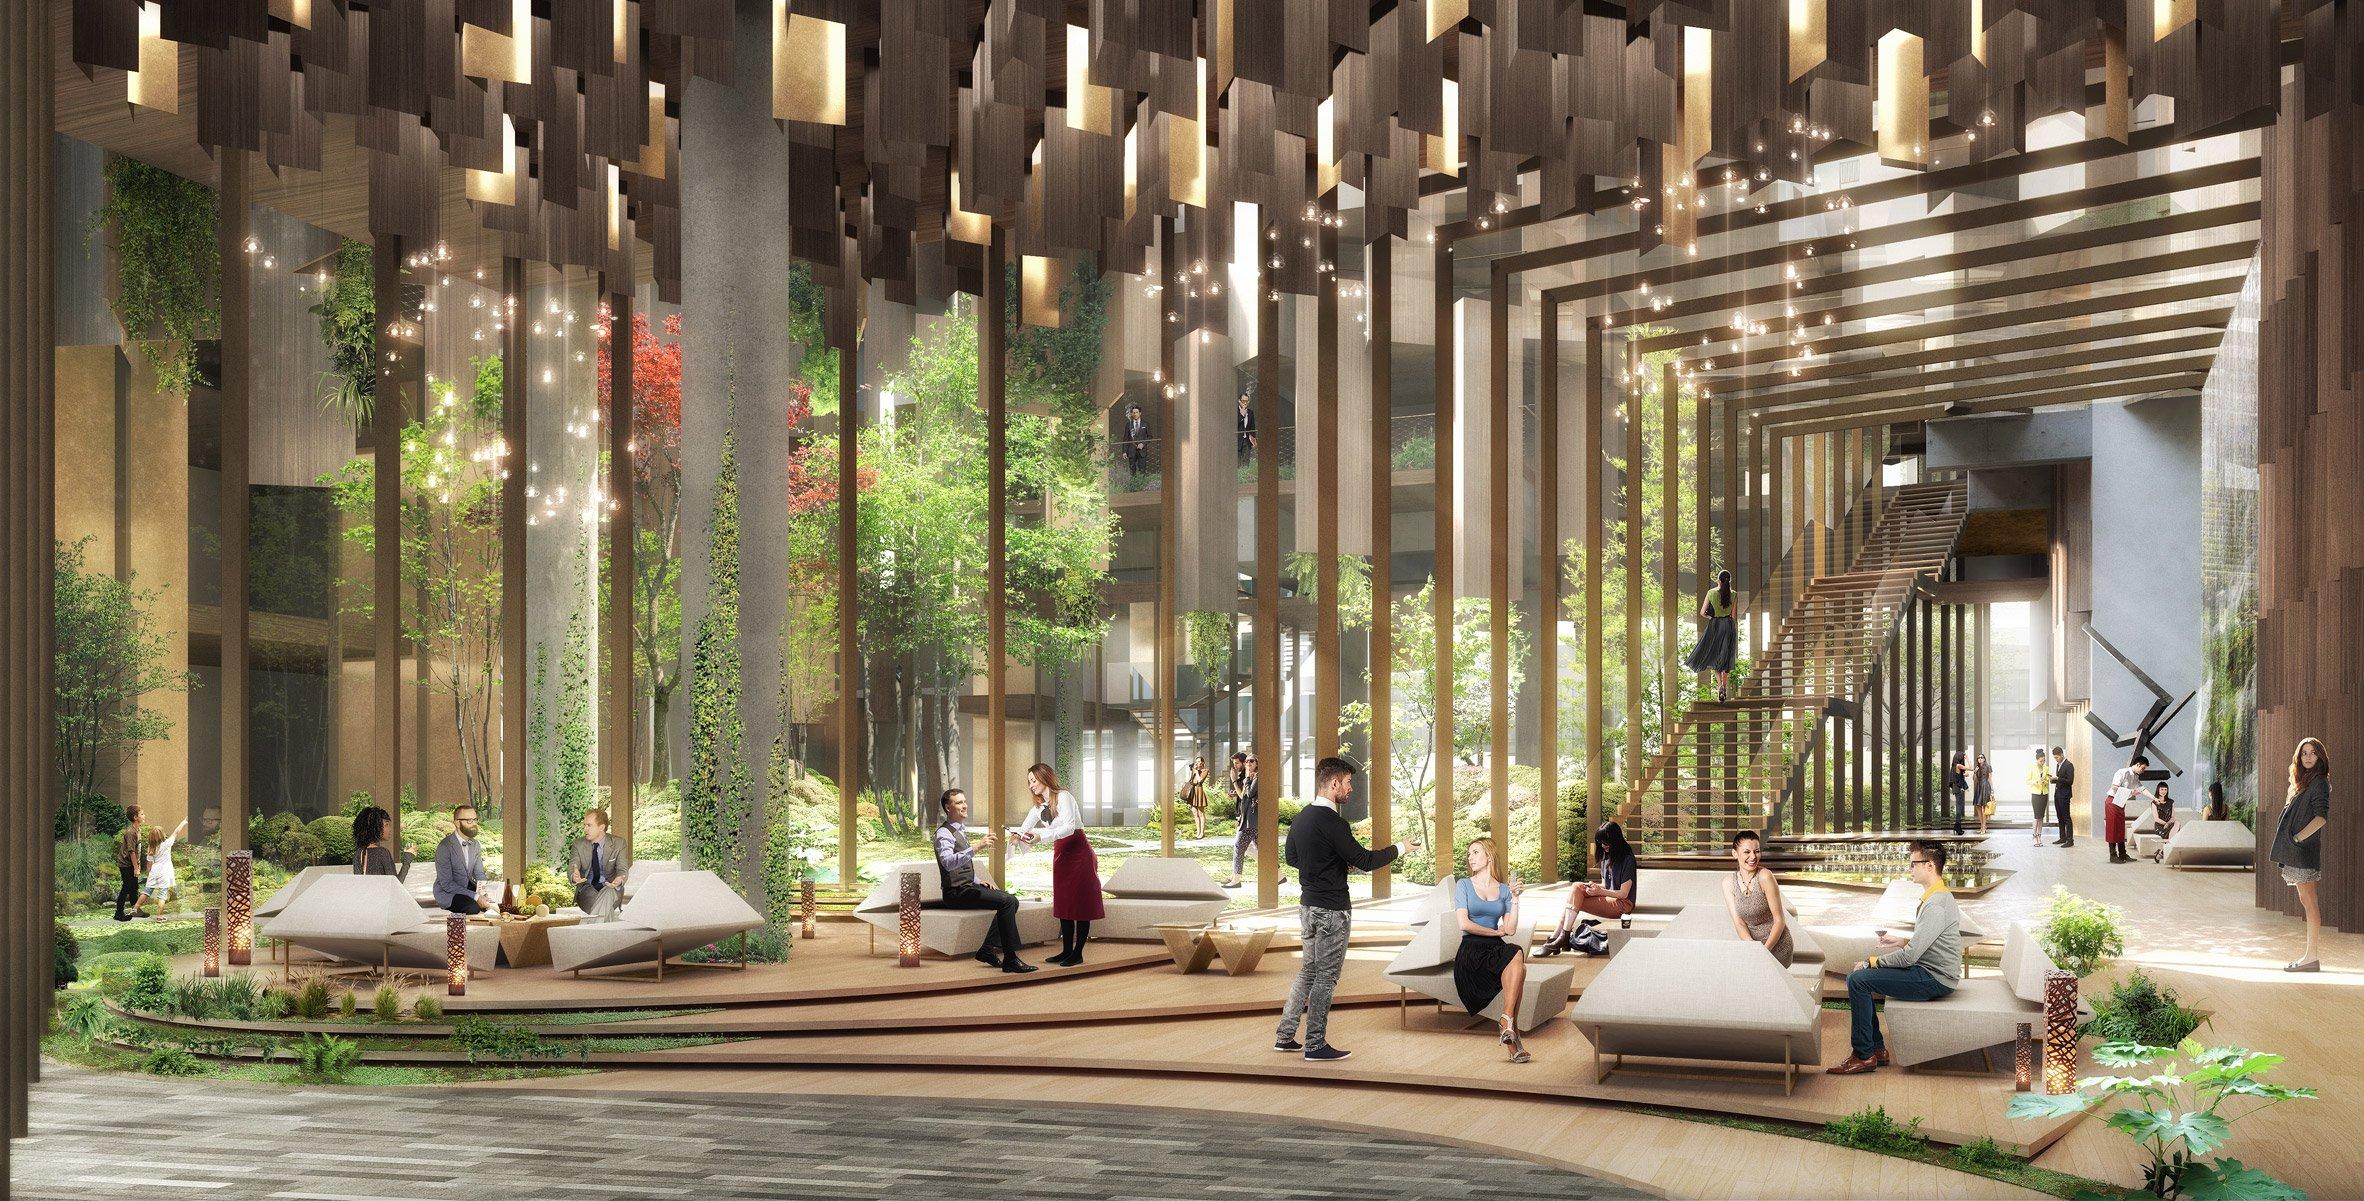 Kengo Kuma Architectsi disainitud arhitektuurivisualisatsioon Eco-Luxury Hotelist Pariisis (Kengo Kuma Architects, Dezeen)